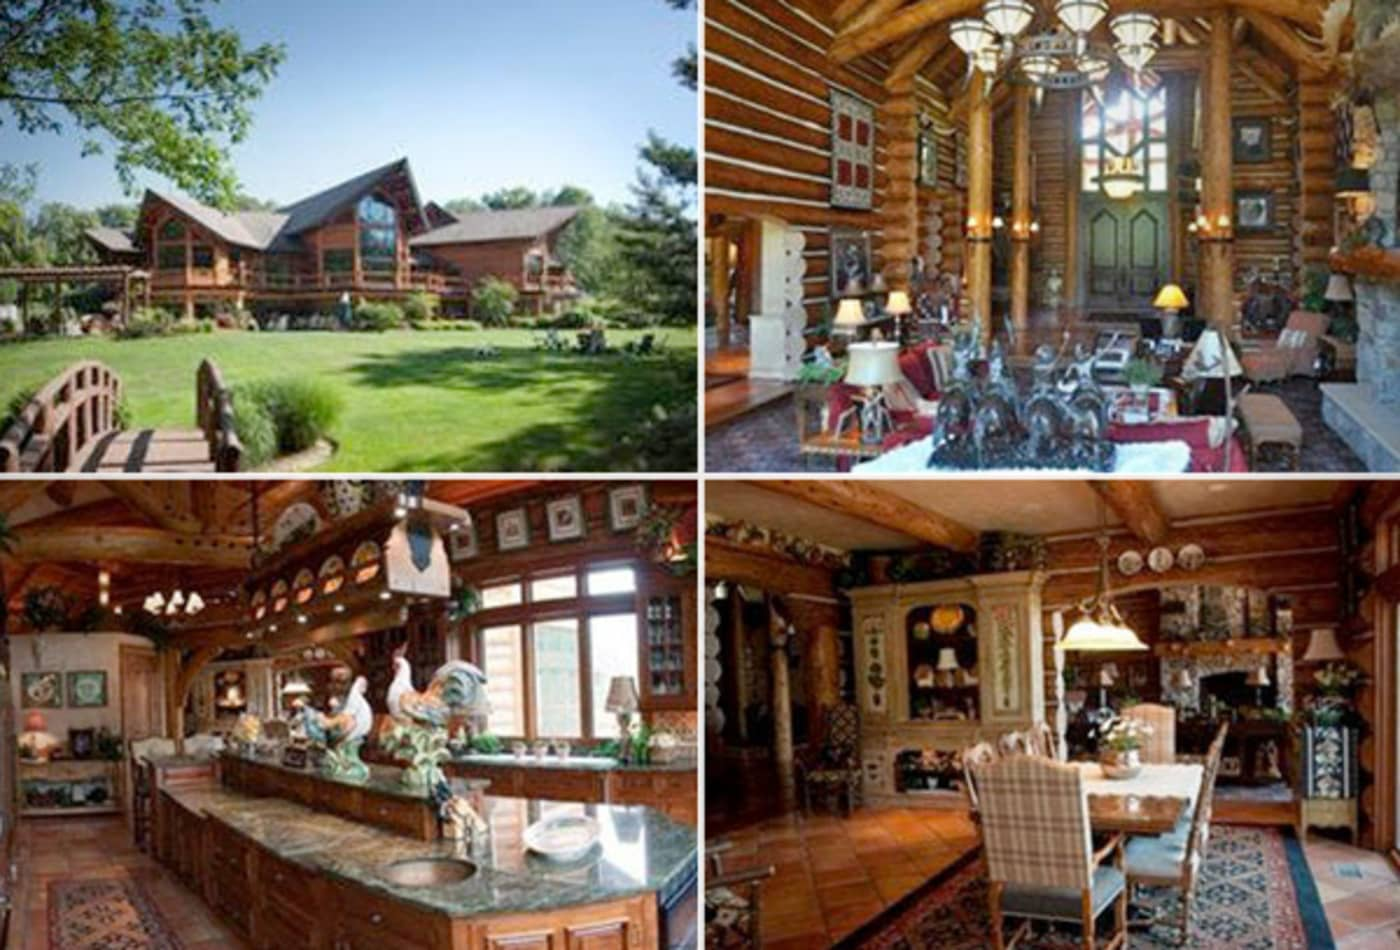 CNBC_luxurious_log_cabins_ohio.jpg